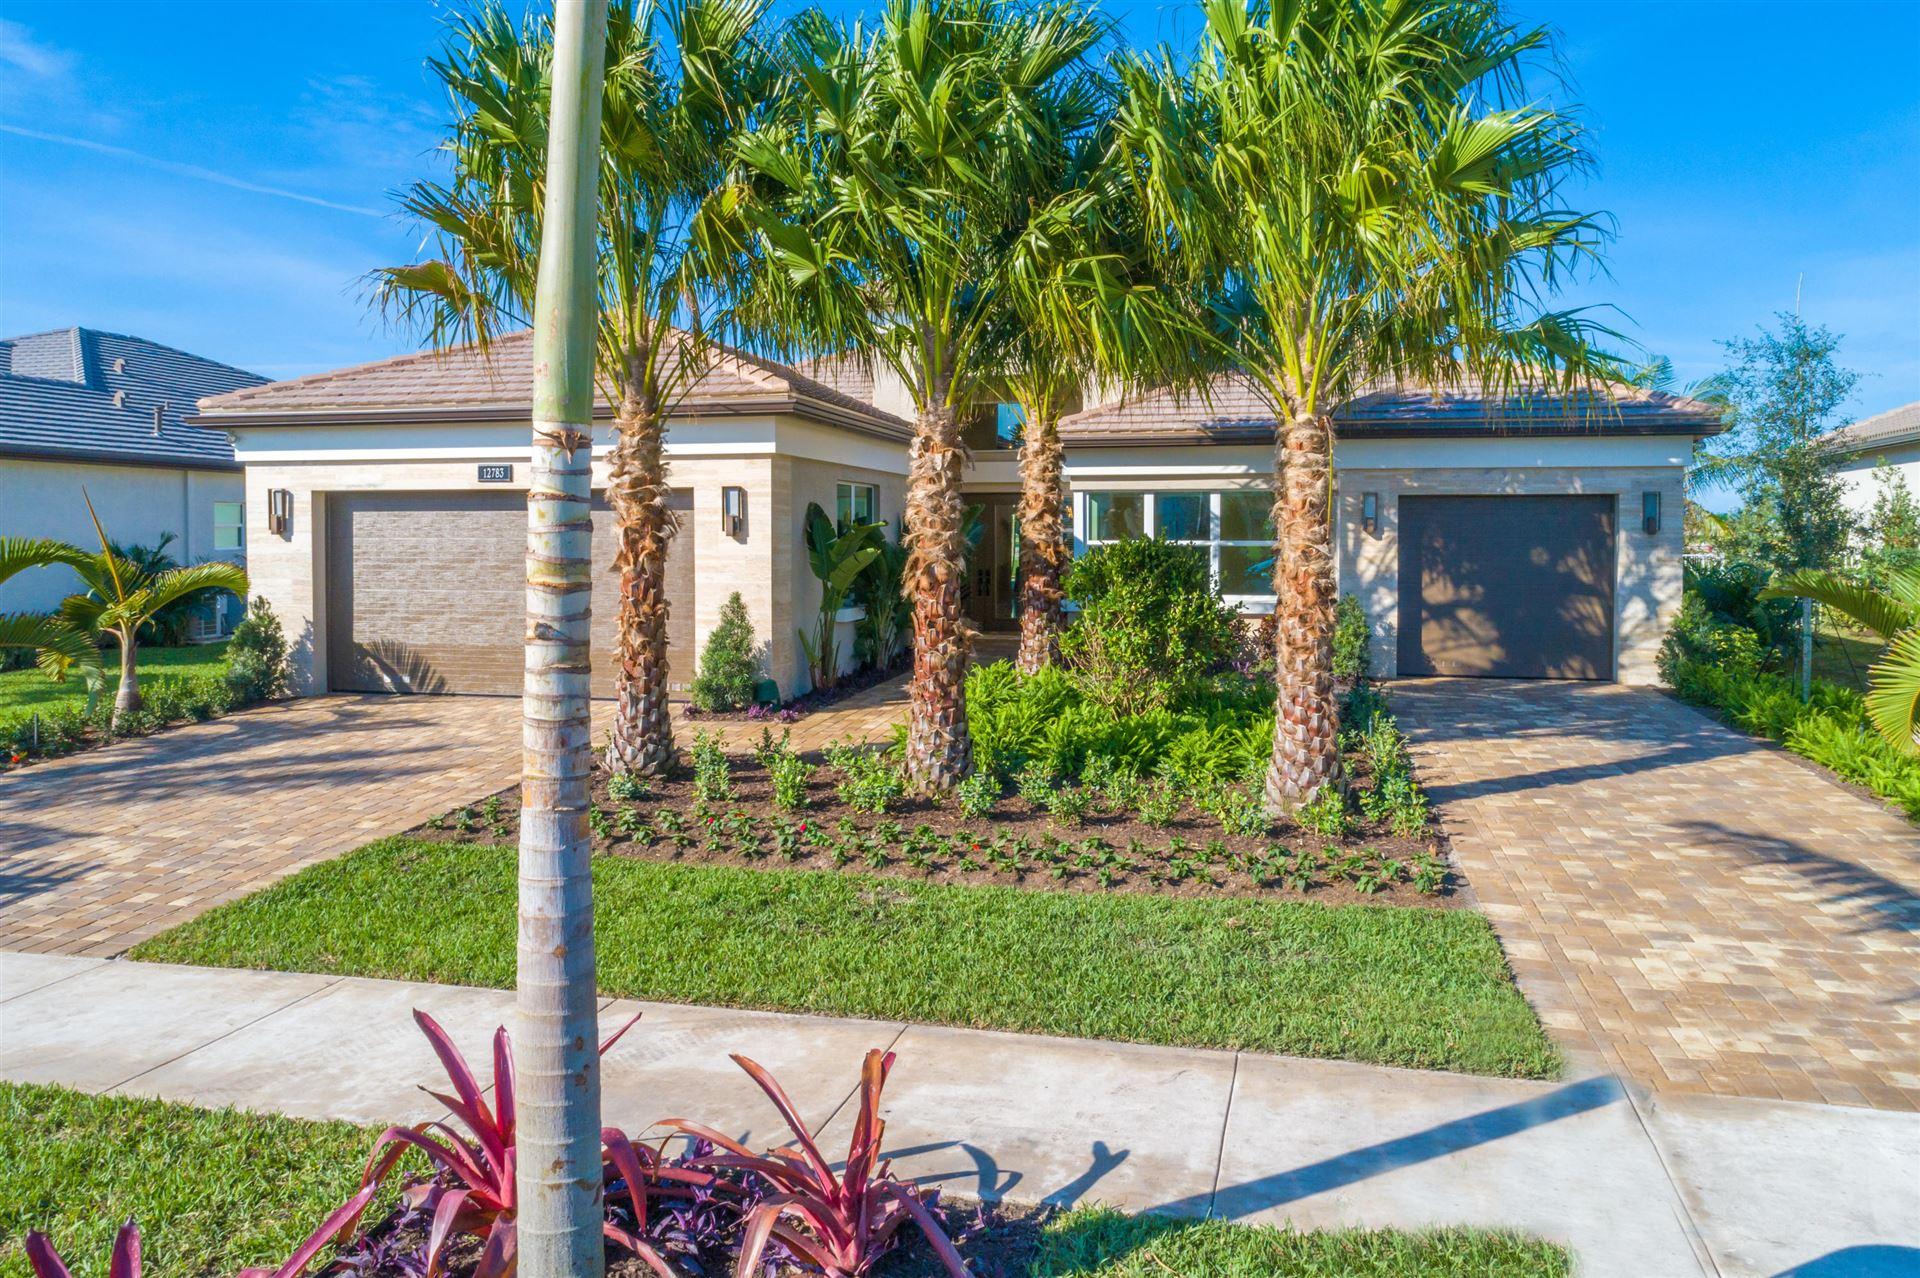 Photo of 12796 Veneto Springs Drive, Boynton Beach, FL 33473 (MLS # RX-10667071)